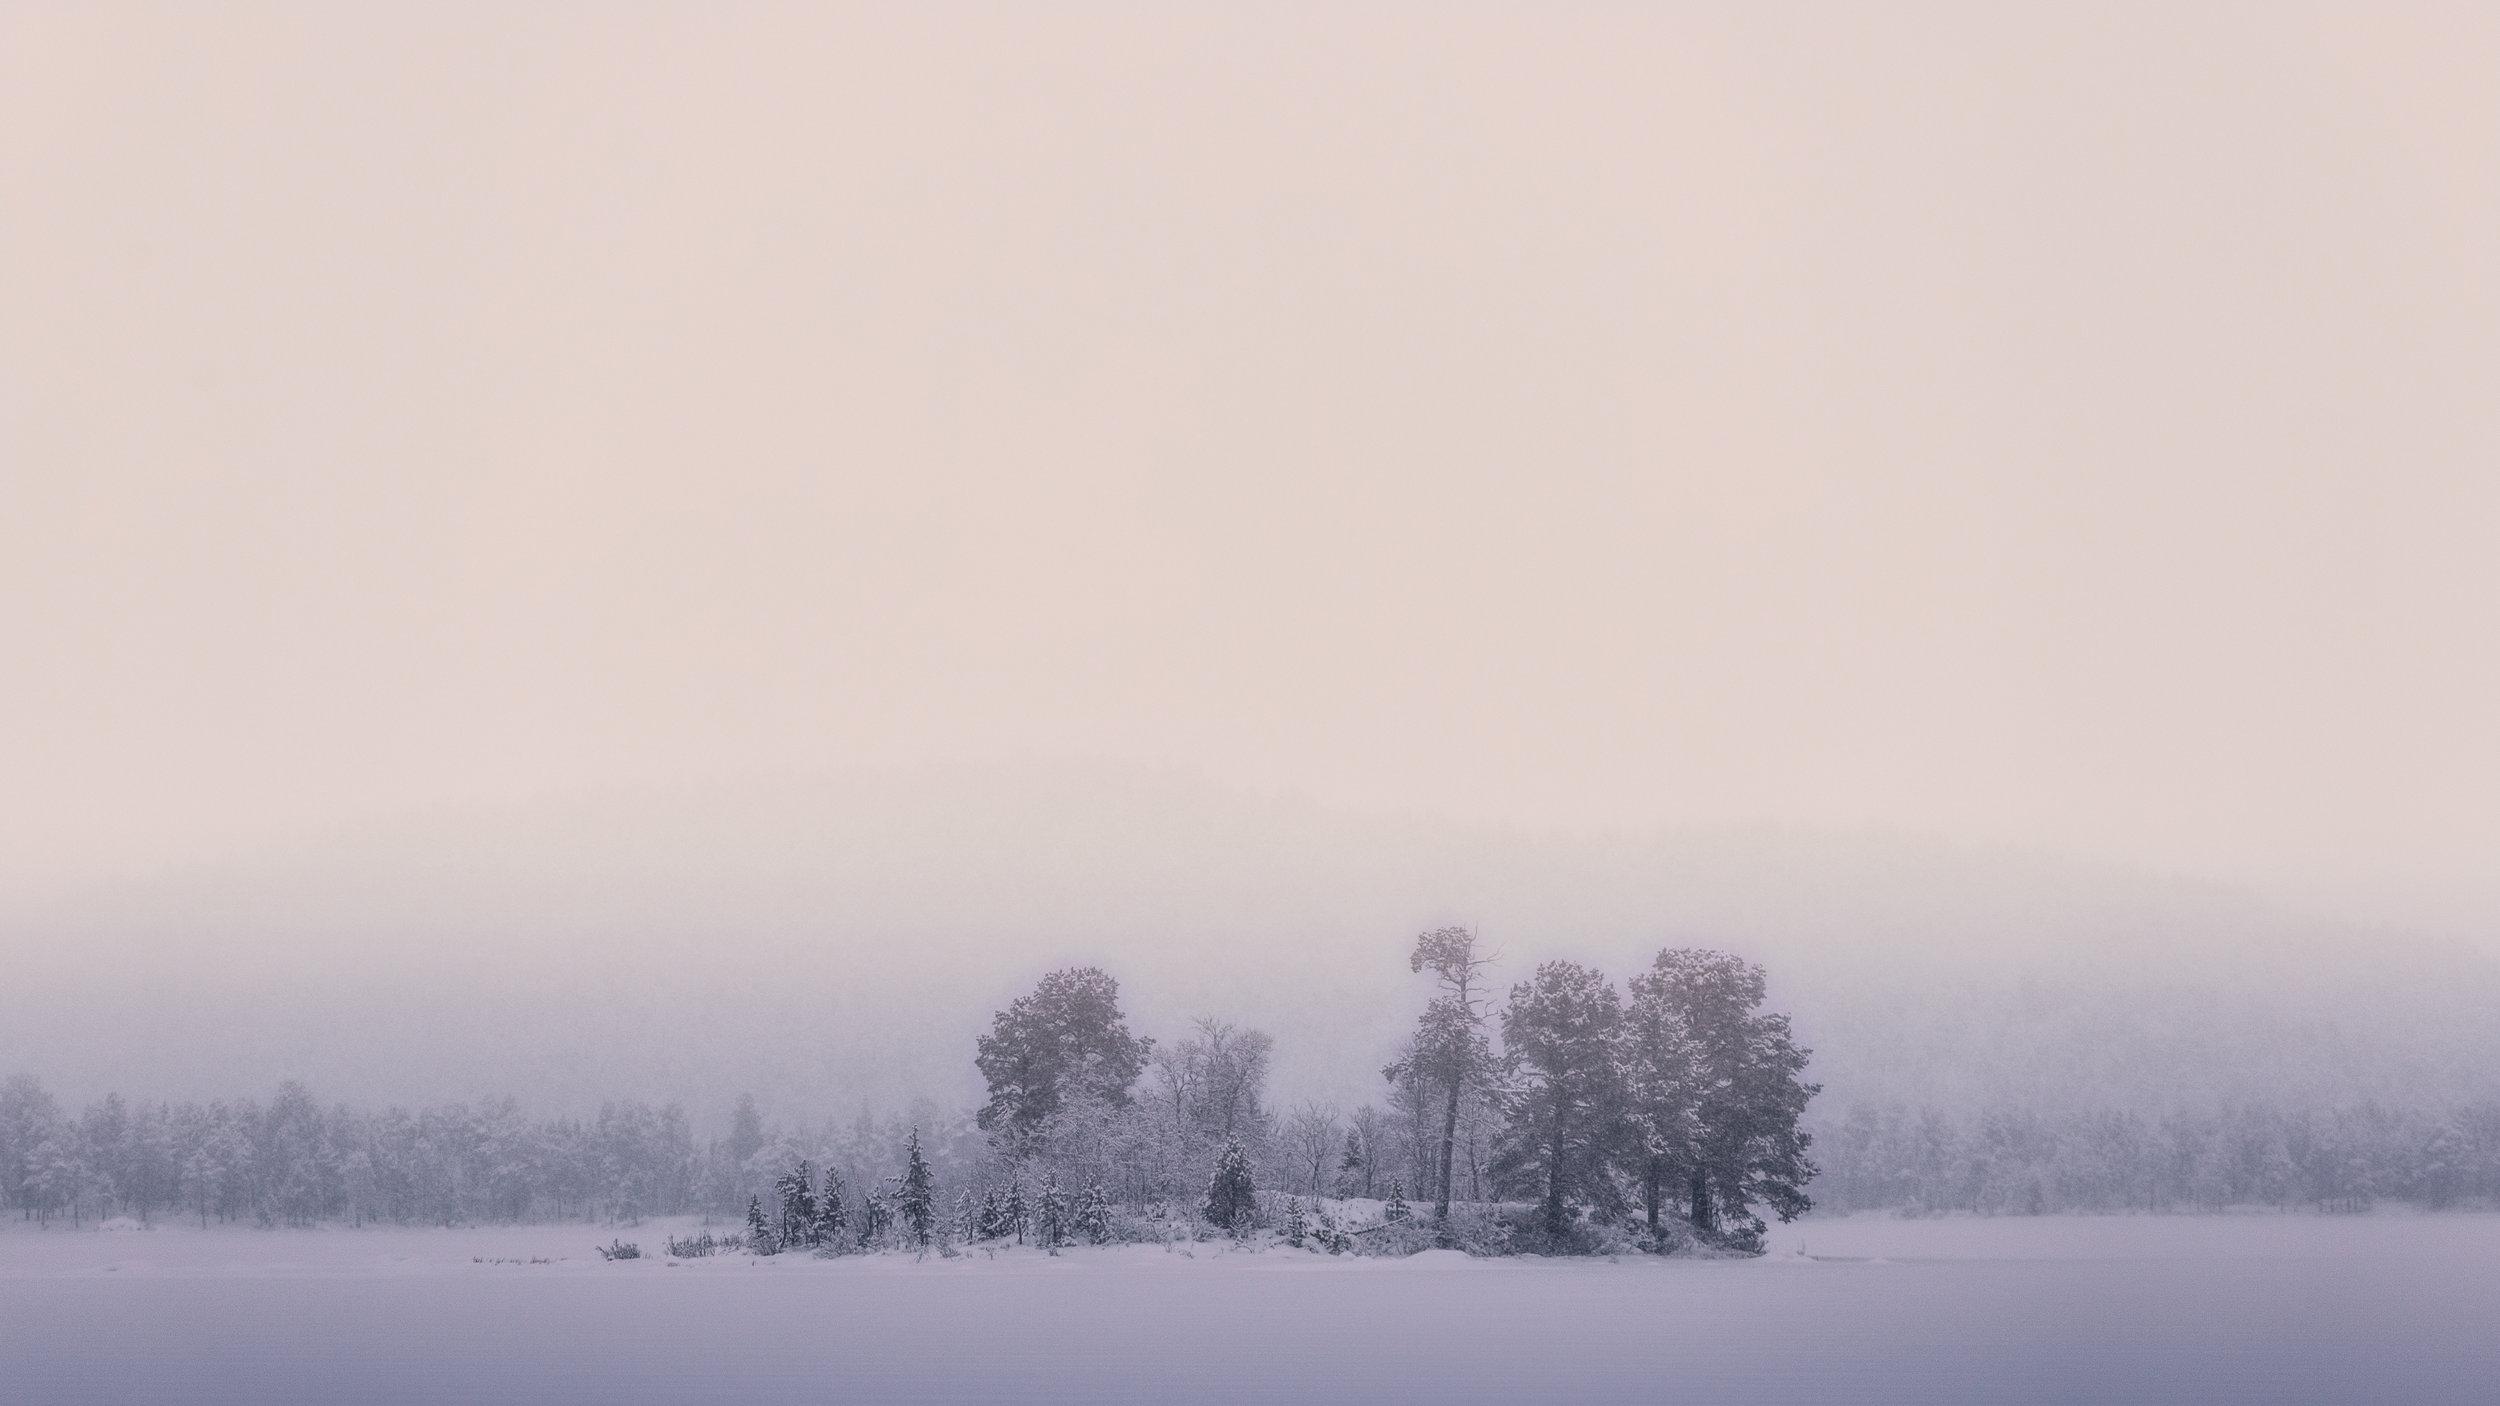 Under a veil of mist, the subtle tones of Polar night warm the landscape.